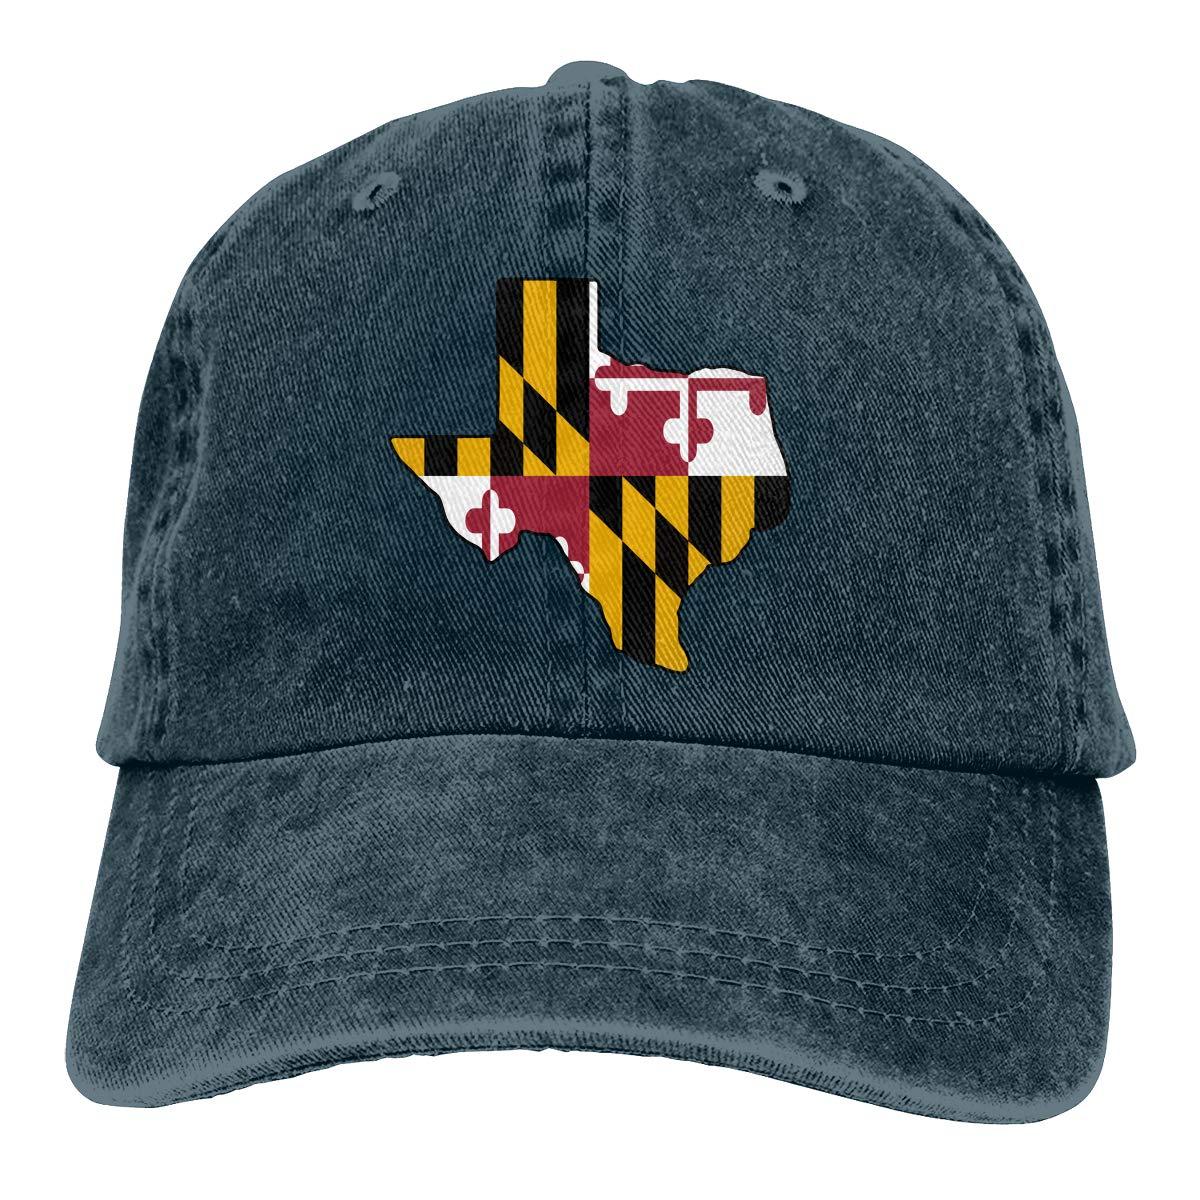 Texas Outline Maryland Flag Adult Trendy Cowboy Sun Hat Adjustable Baseball Cap